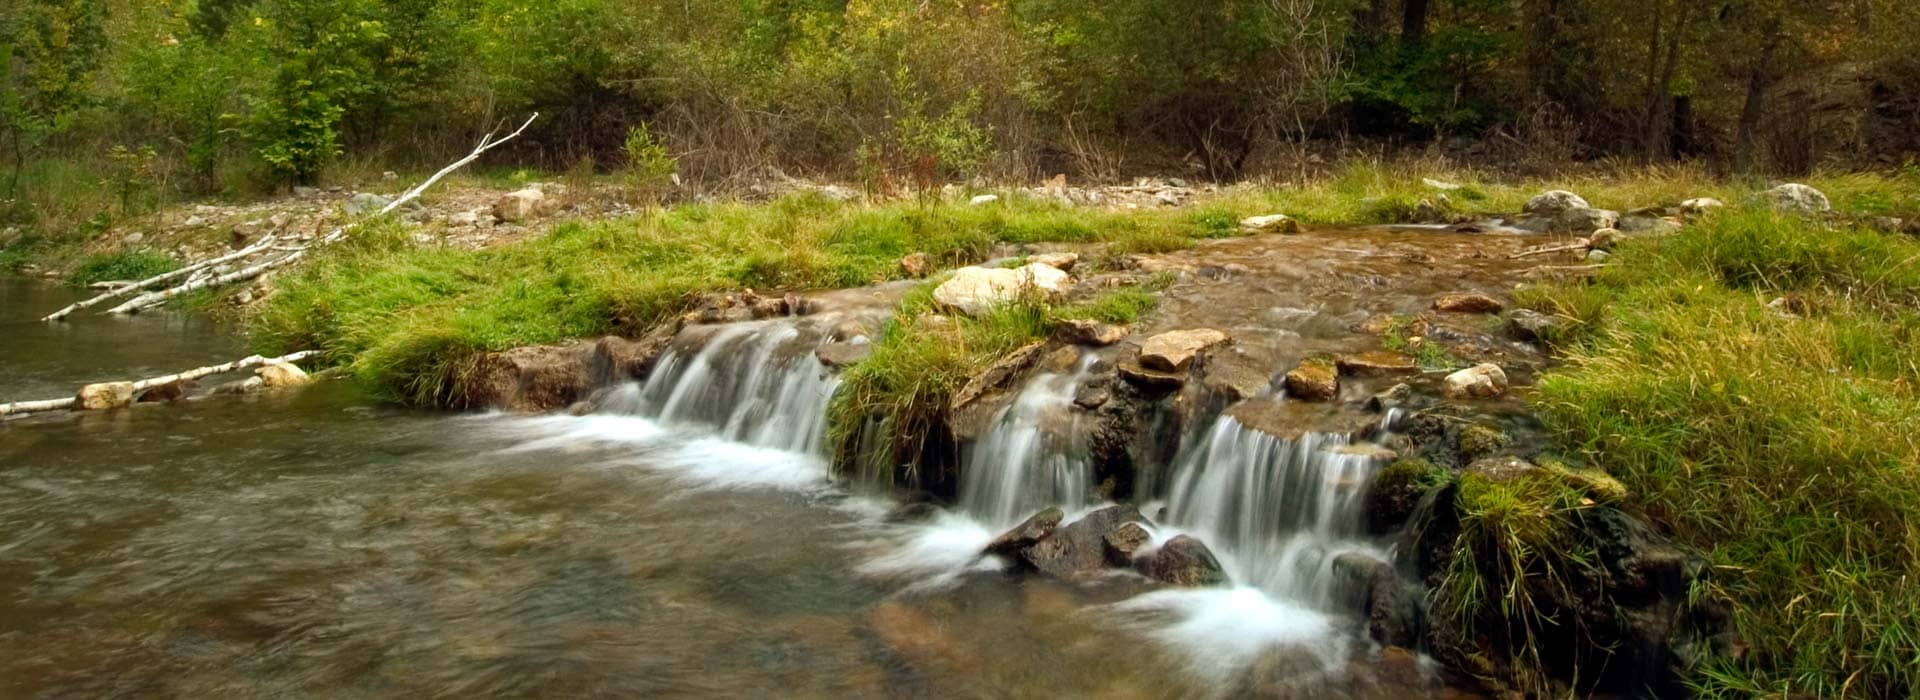 Ordinaire Black Hills SD Vacation Rentals | Black Hills Vacation Homes